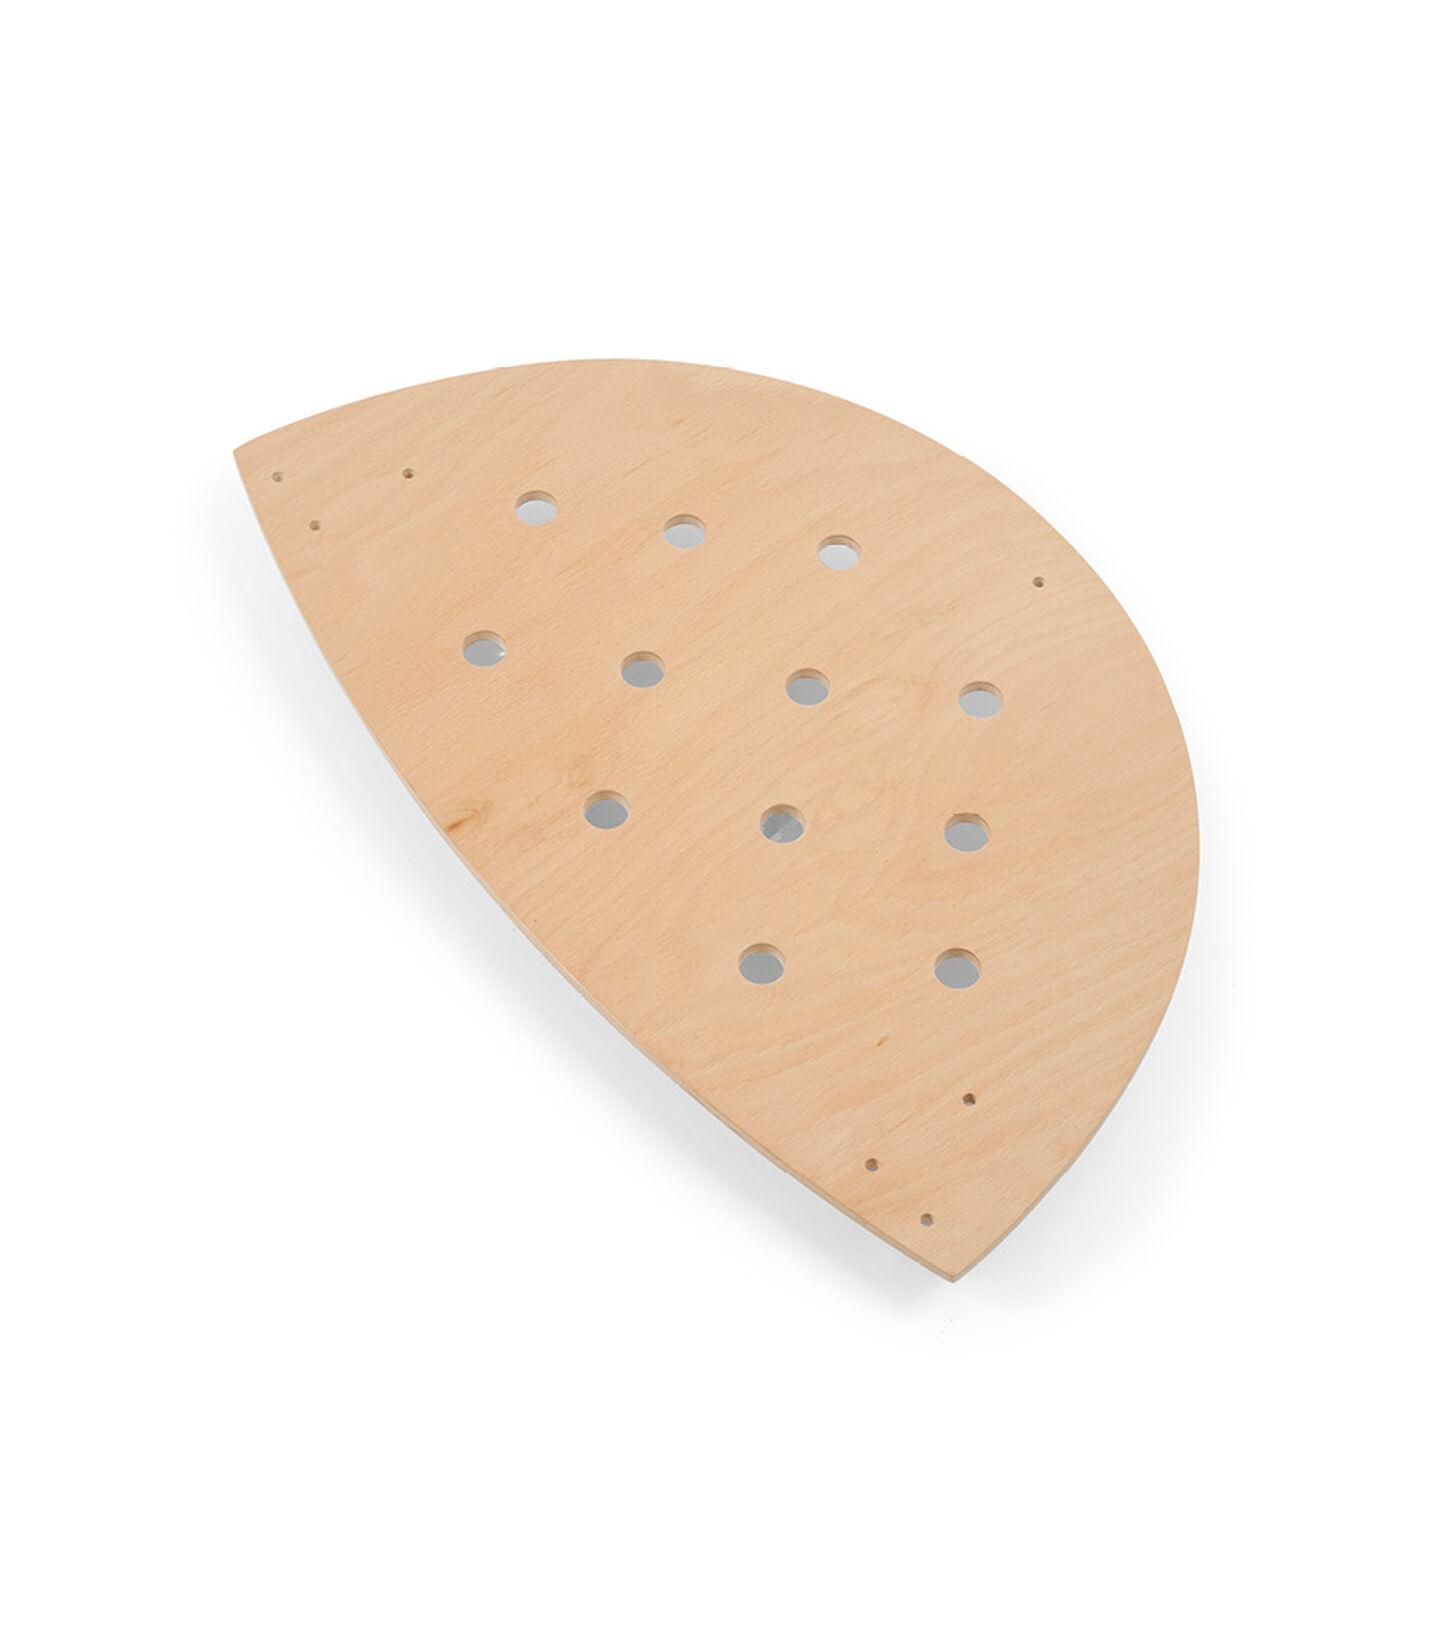 Stokke® Sleepi™ Sängbotten, änddel (plywood) Natural, Natural, mainview